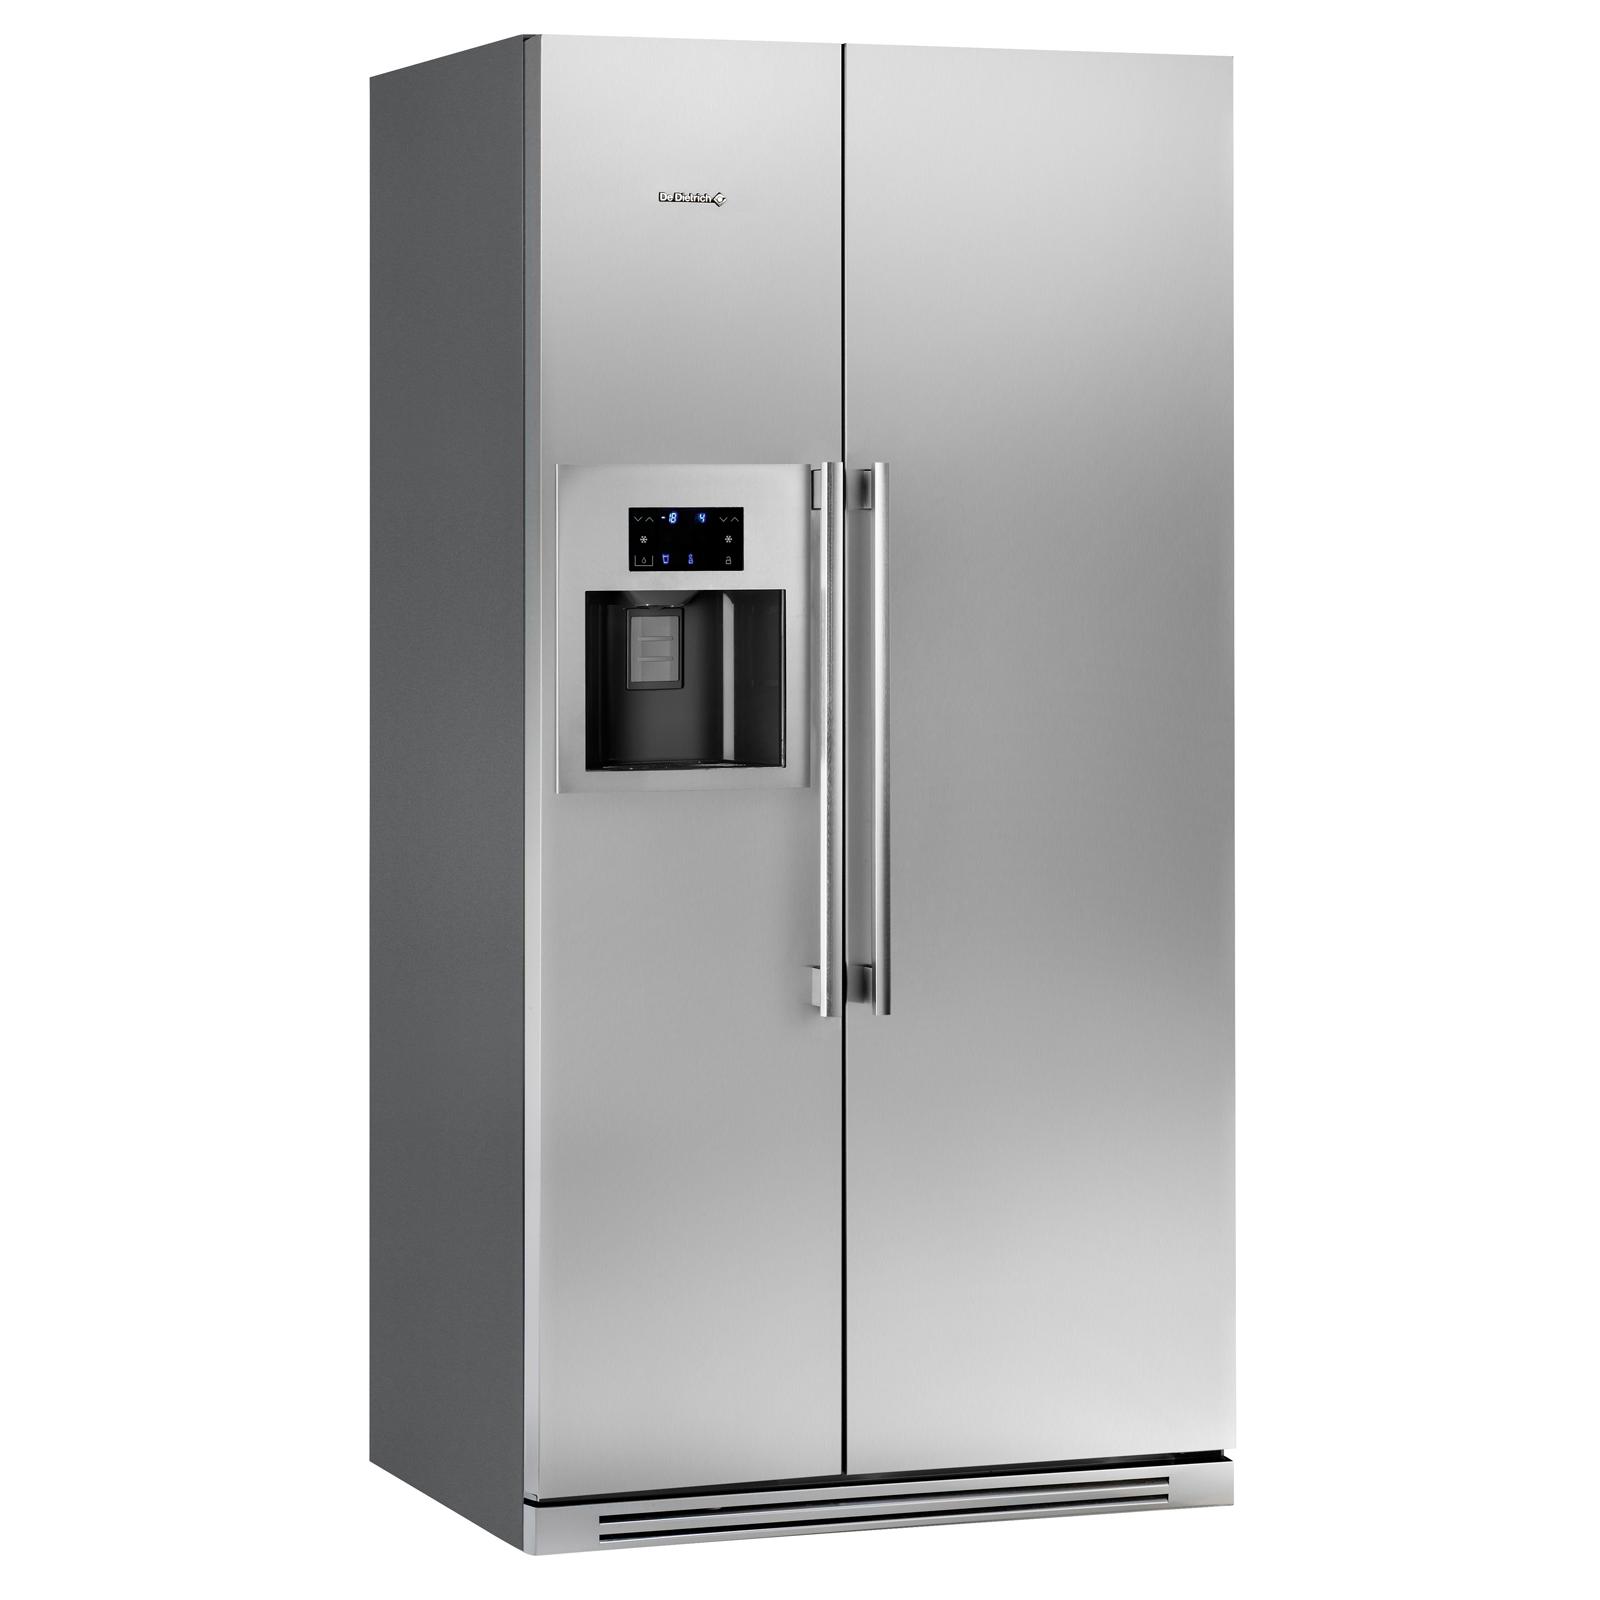 R frig rateur am ricain dka866x de dietrich - Refrigerateur glacon eau fraiche ...